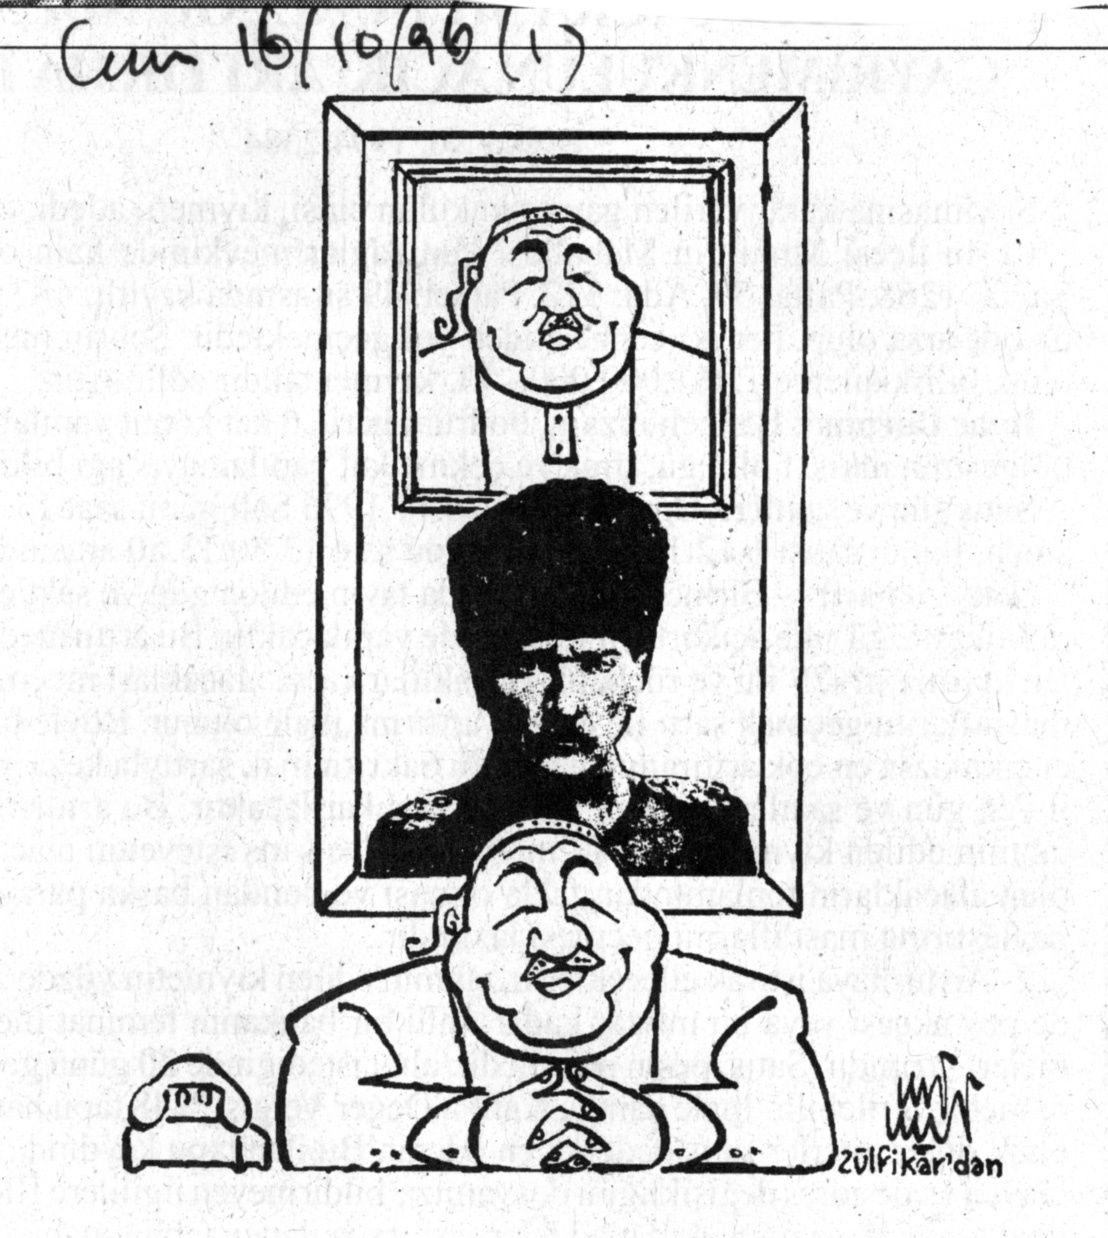 Ali Ulvi, Cumhuriyet, 16 octobre 1996